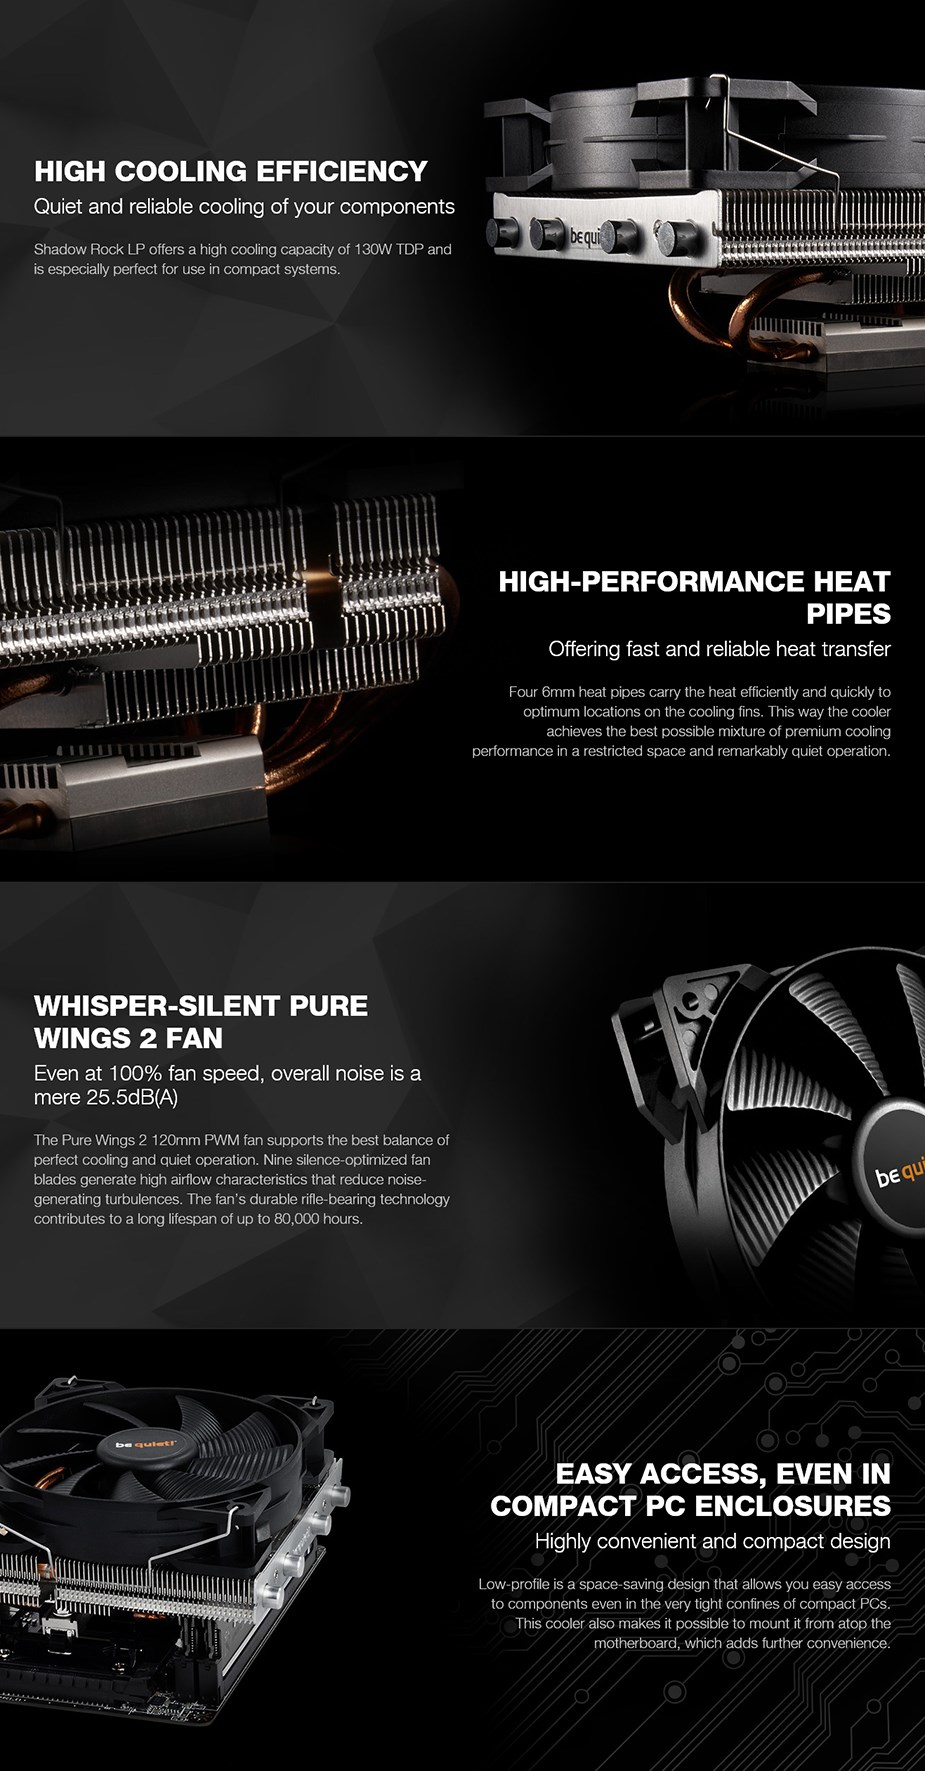 be quiet! Shadow Rock LP CPU Air Cooler - Desktop Overview 1